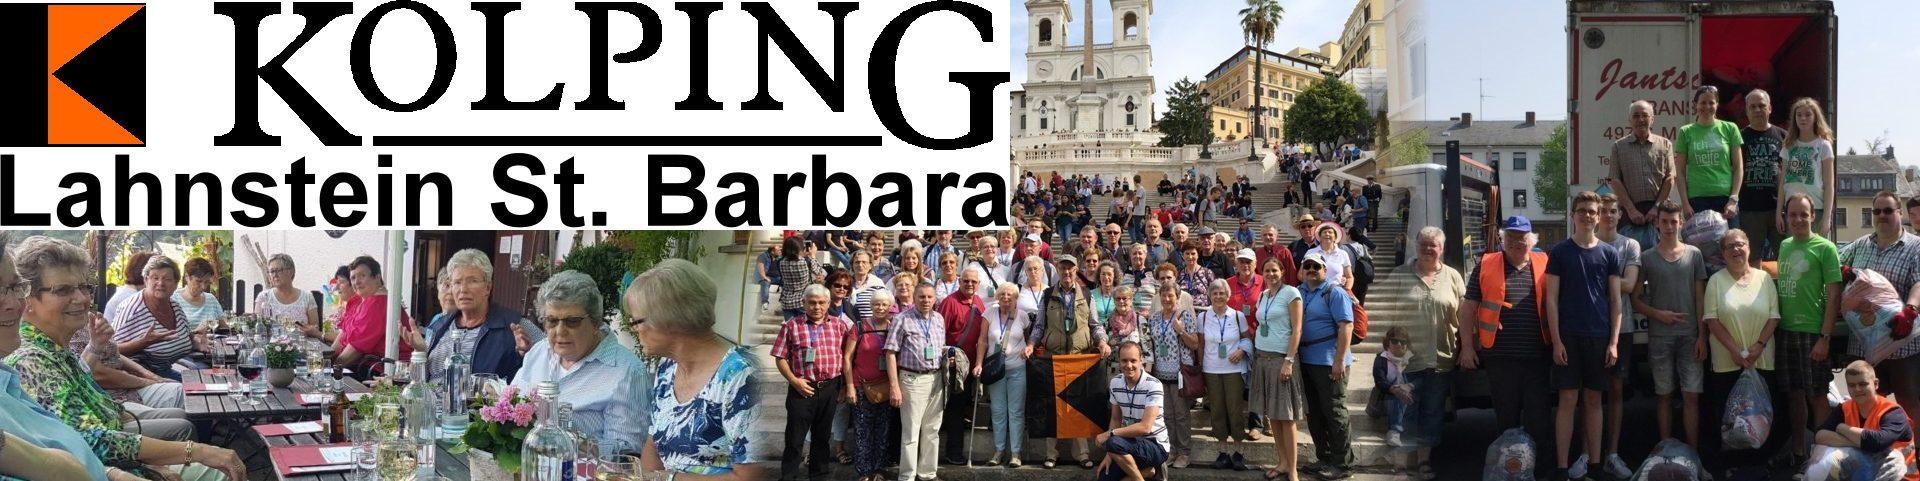 Kolpingfamilie Lahnstein St. Barbara